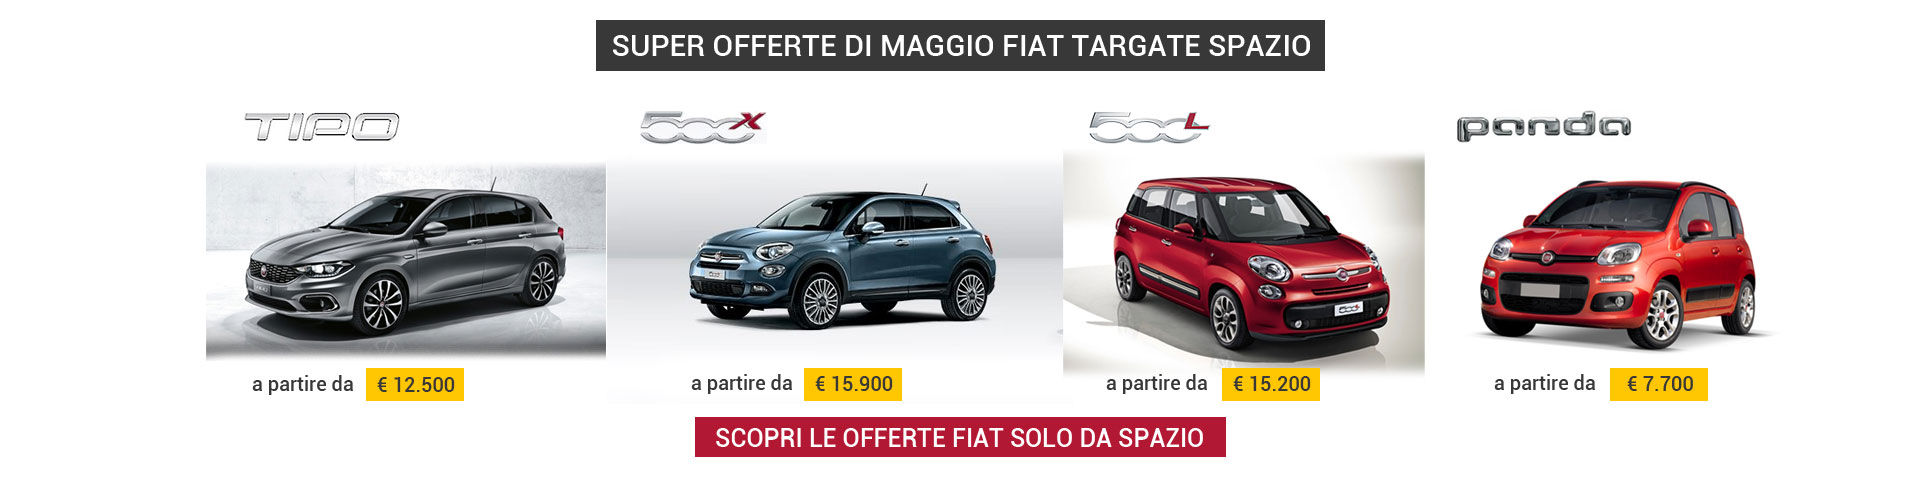 Super Offerte Spazio su gamma Fiat